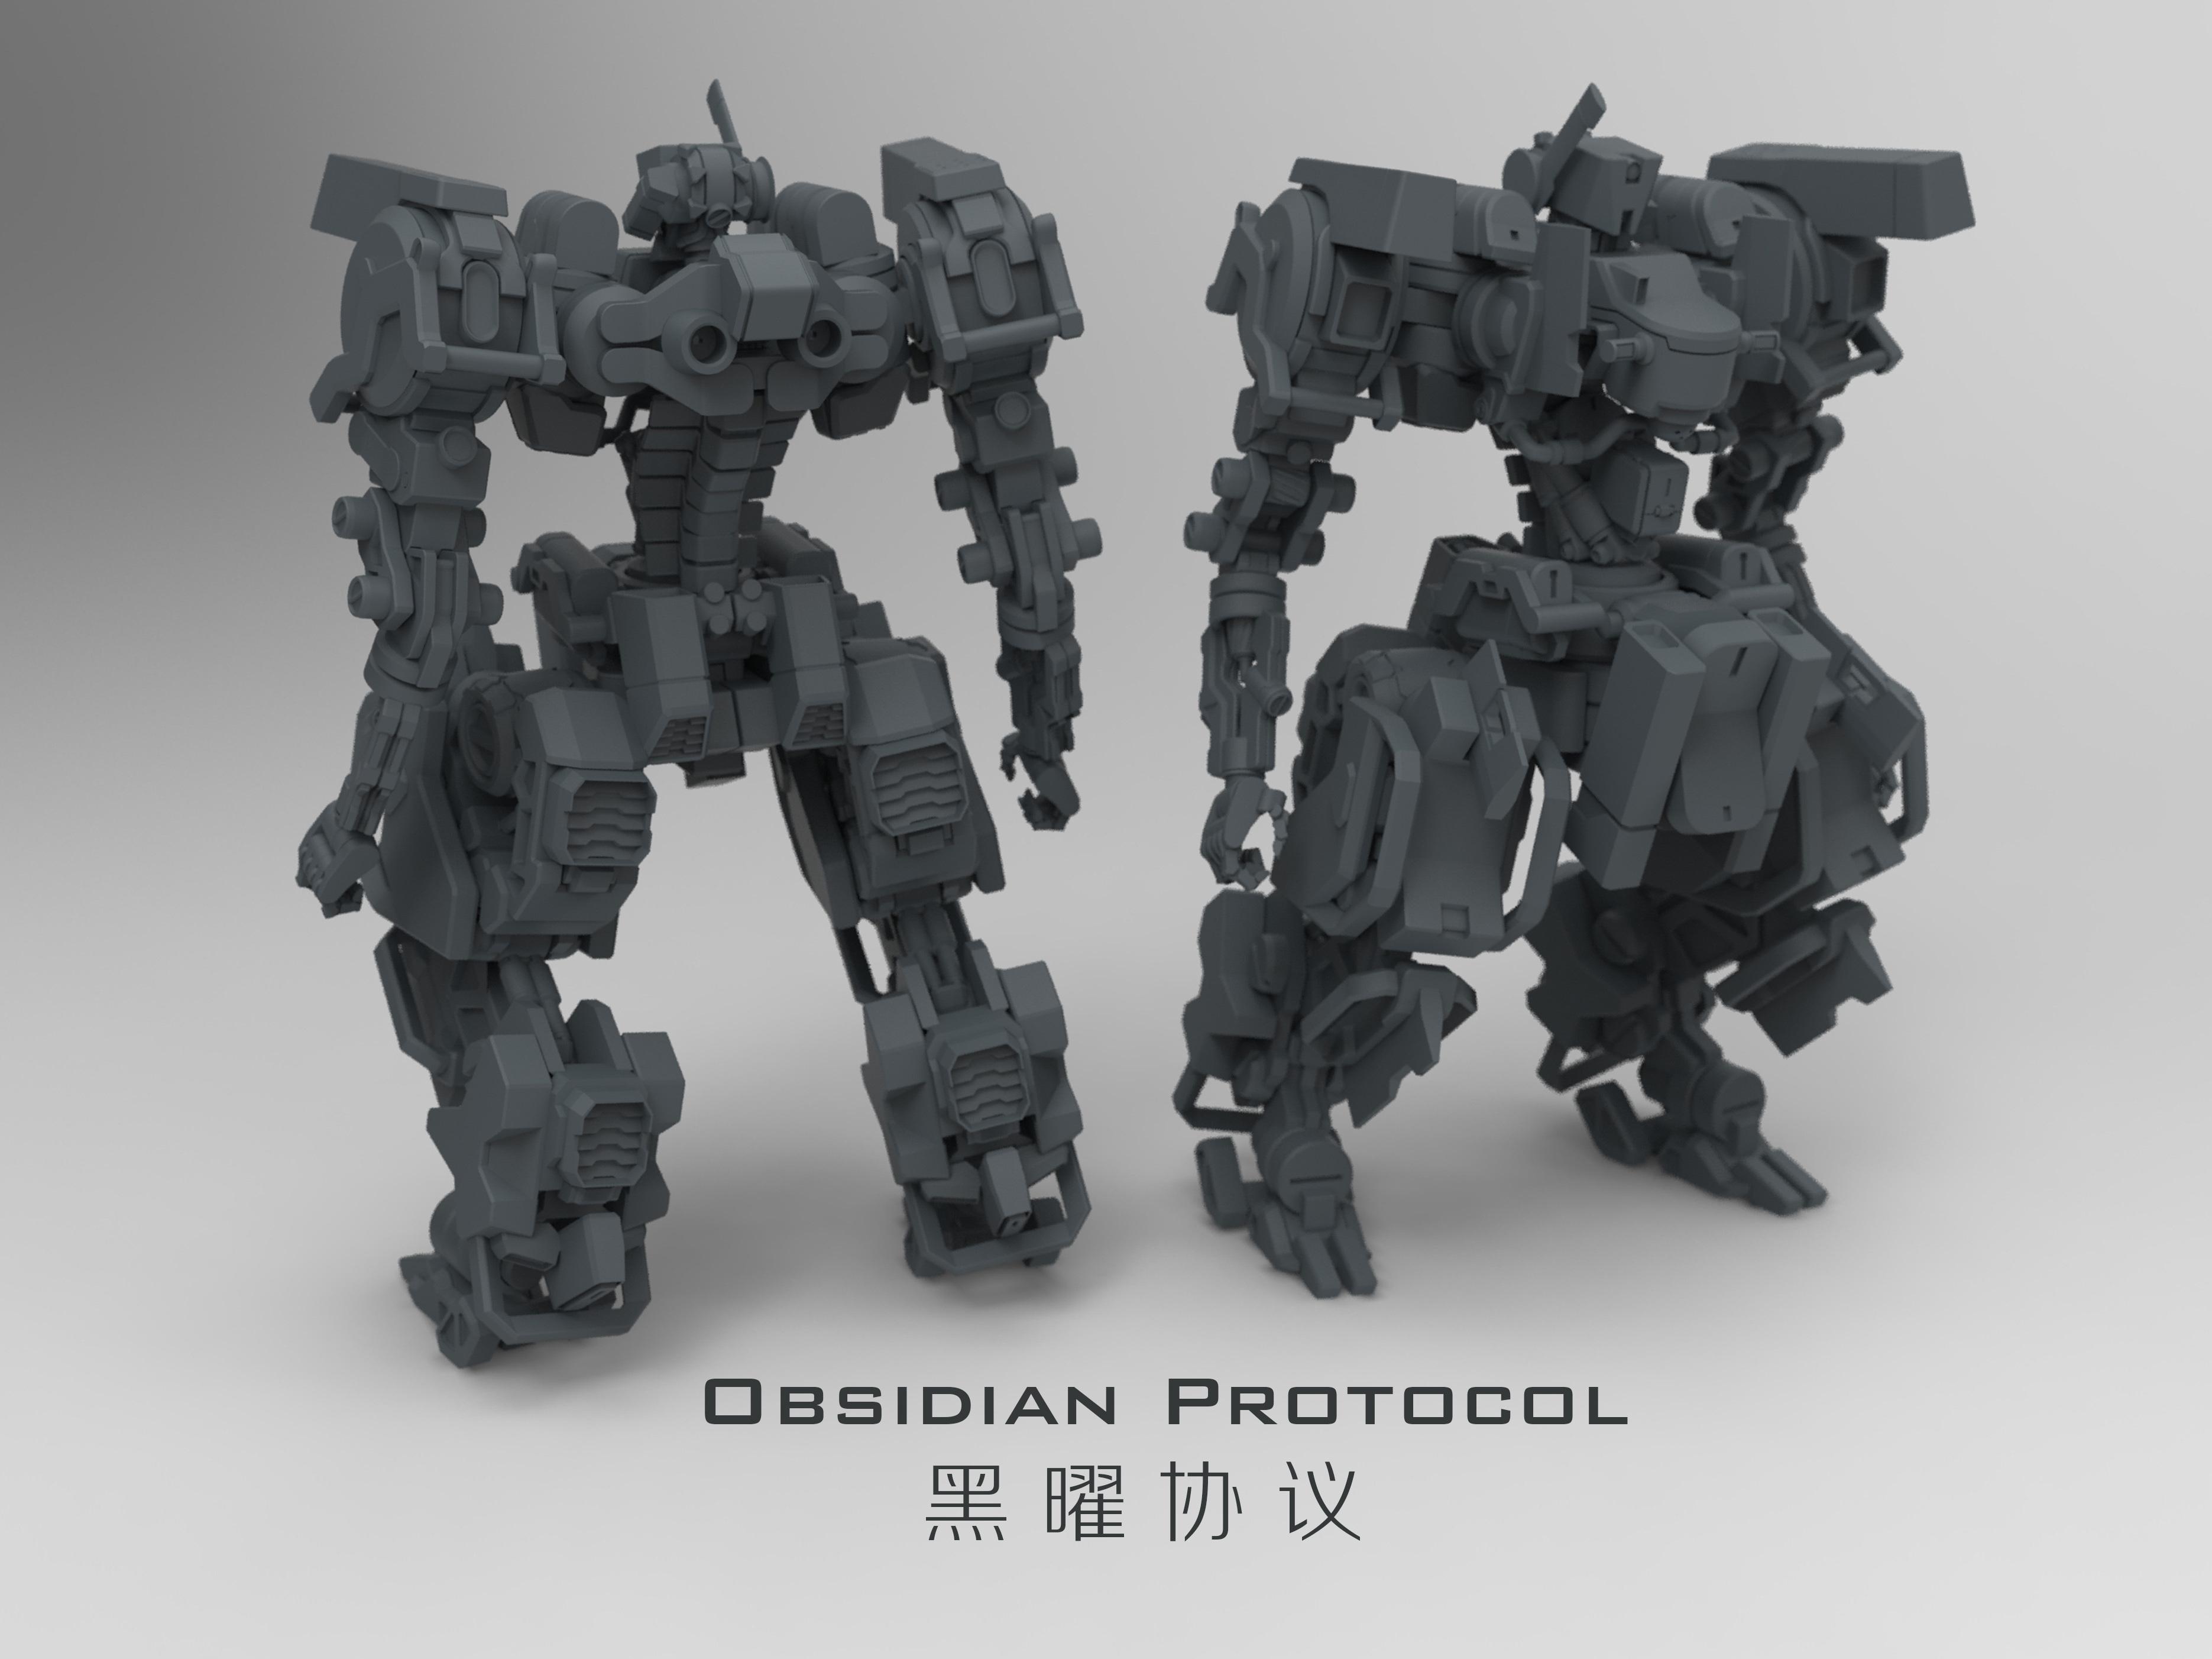 《Obsidian Protocol》黑曜协议